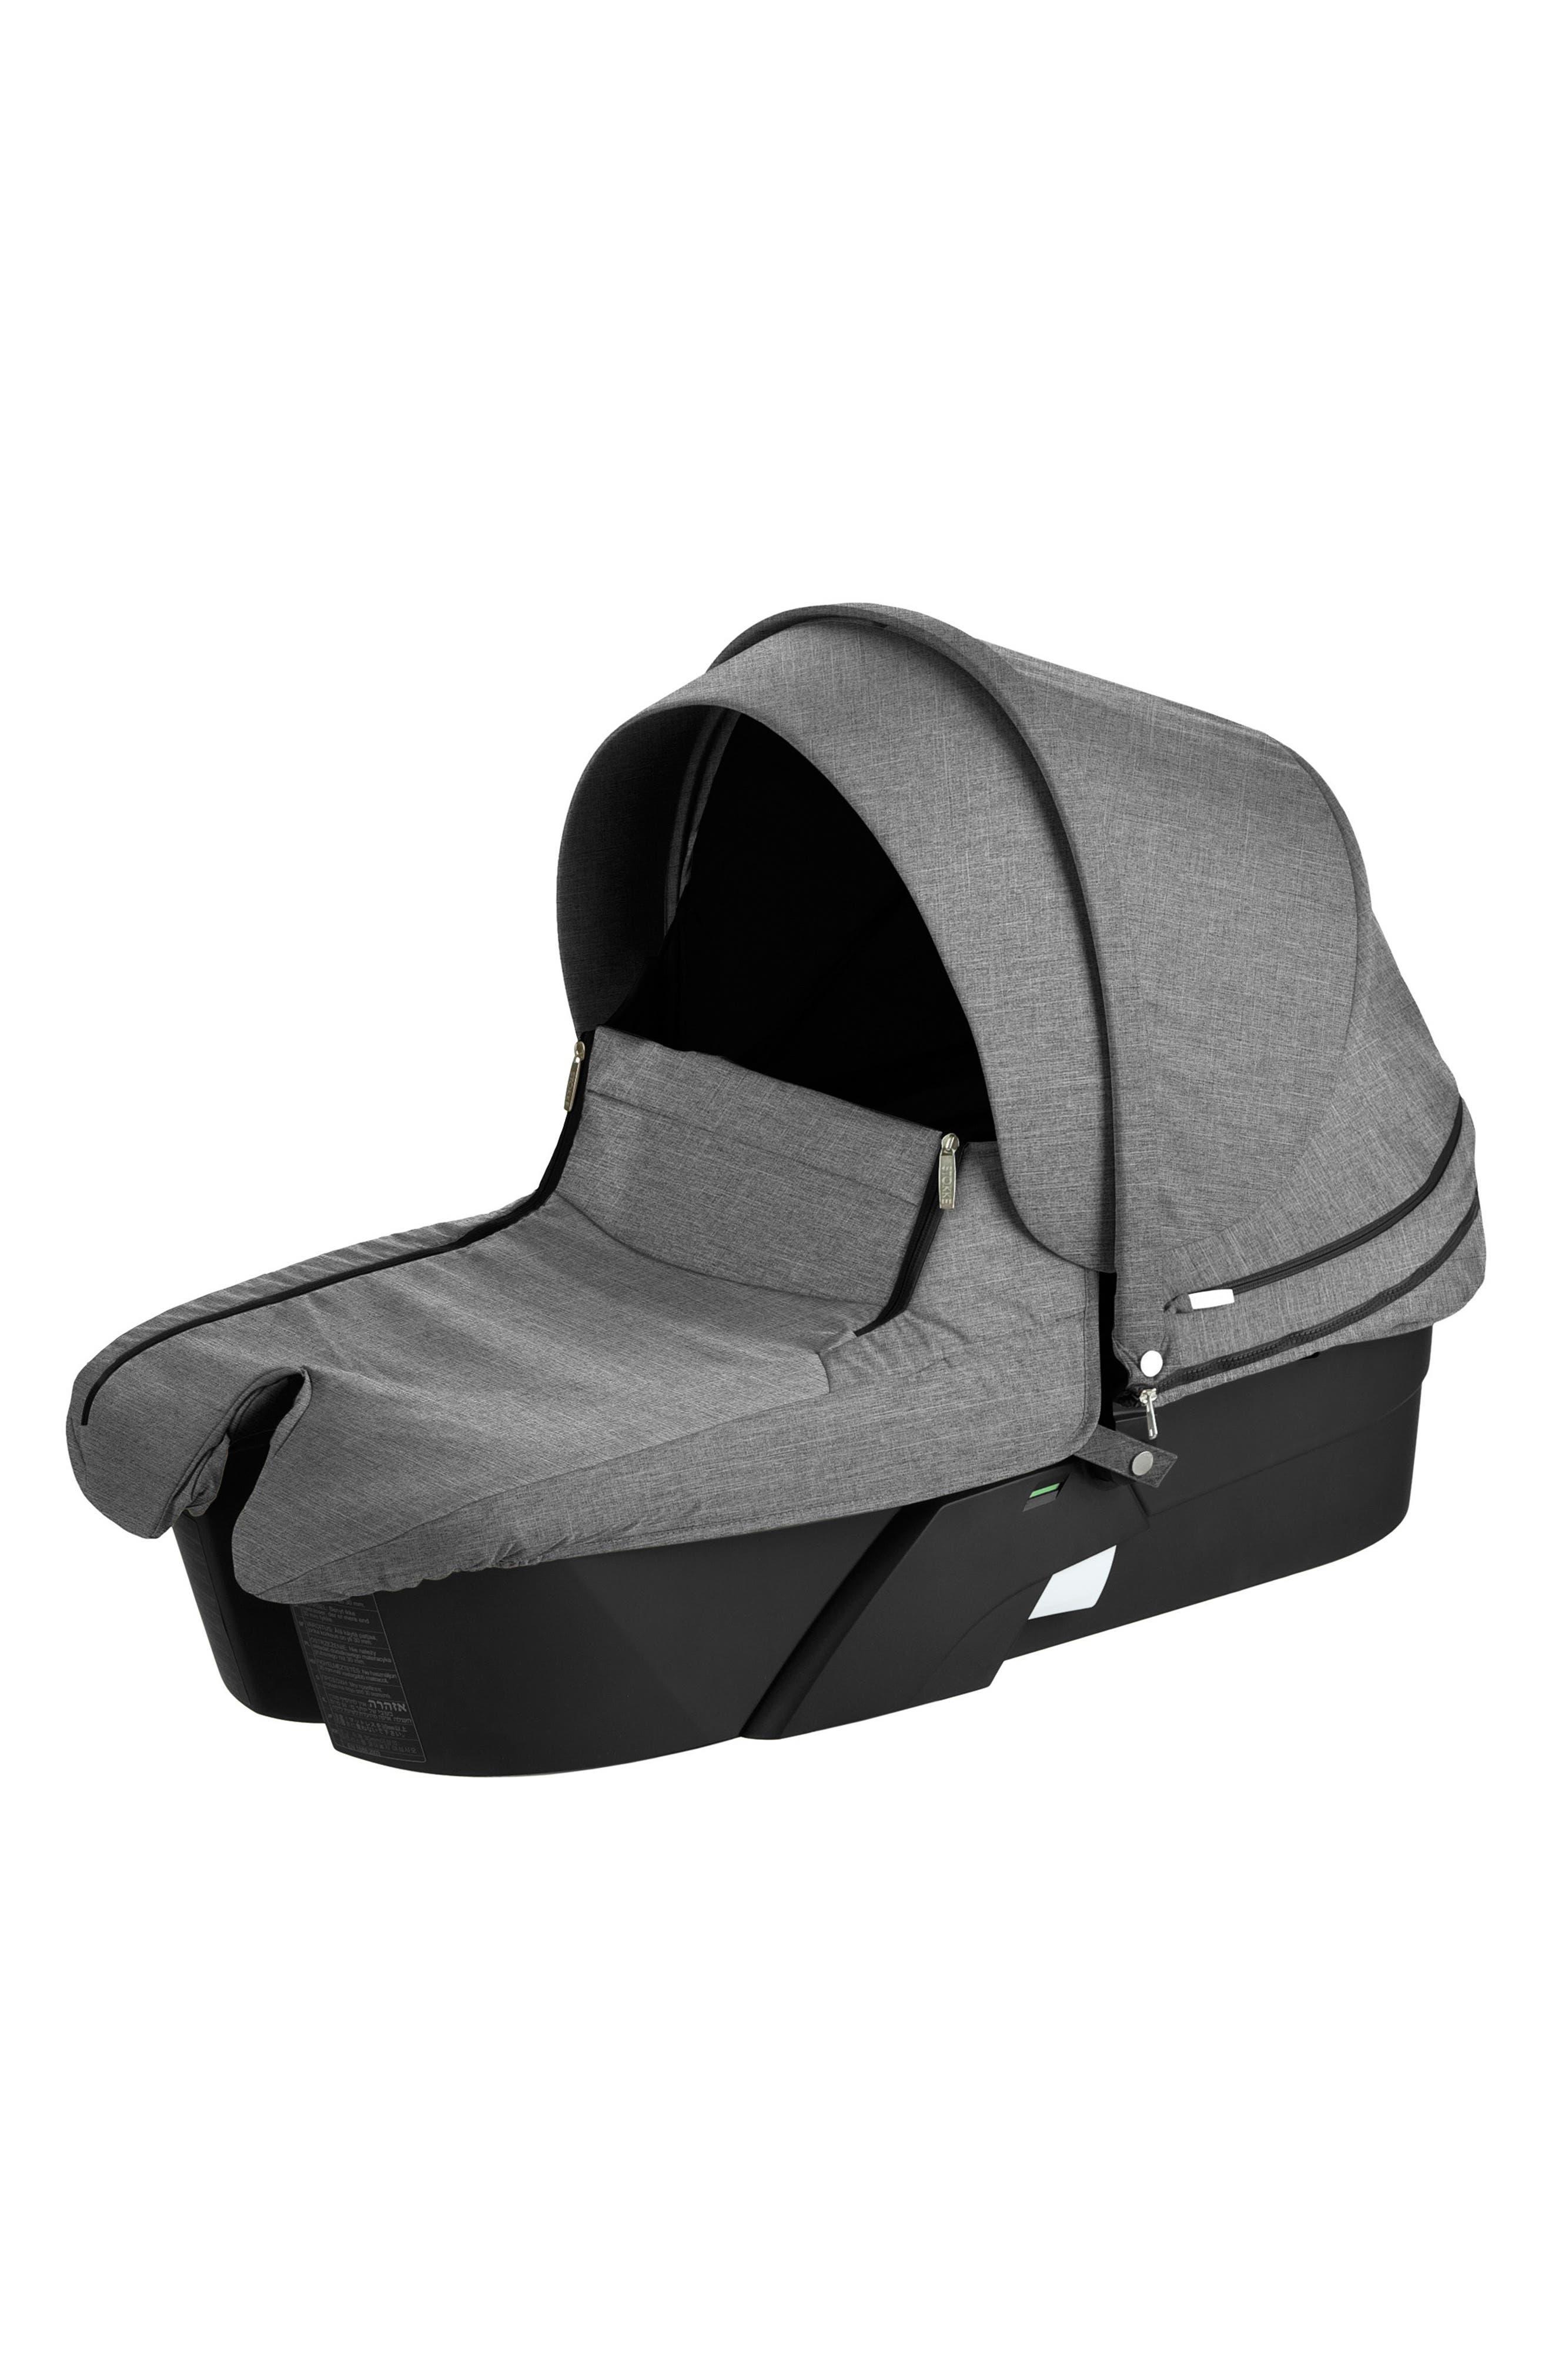 Xplory<sup>®</sup> Stroller Carry Cot,                         Main,                         color, BLACK